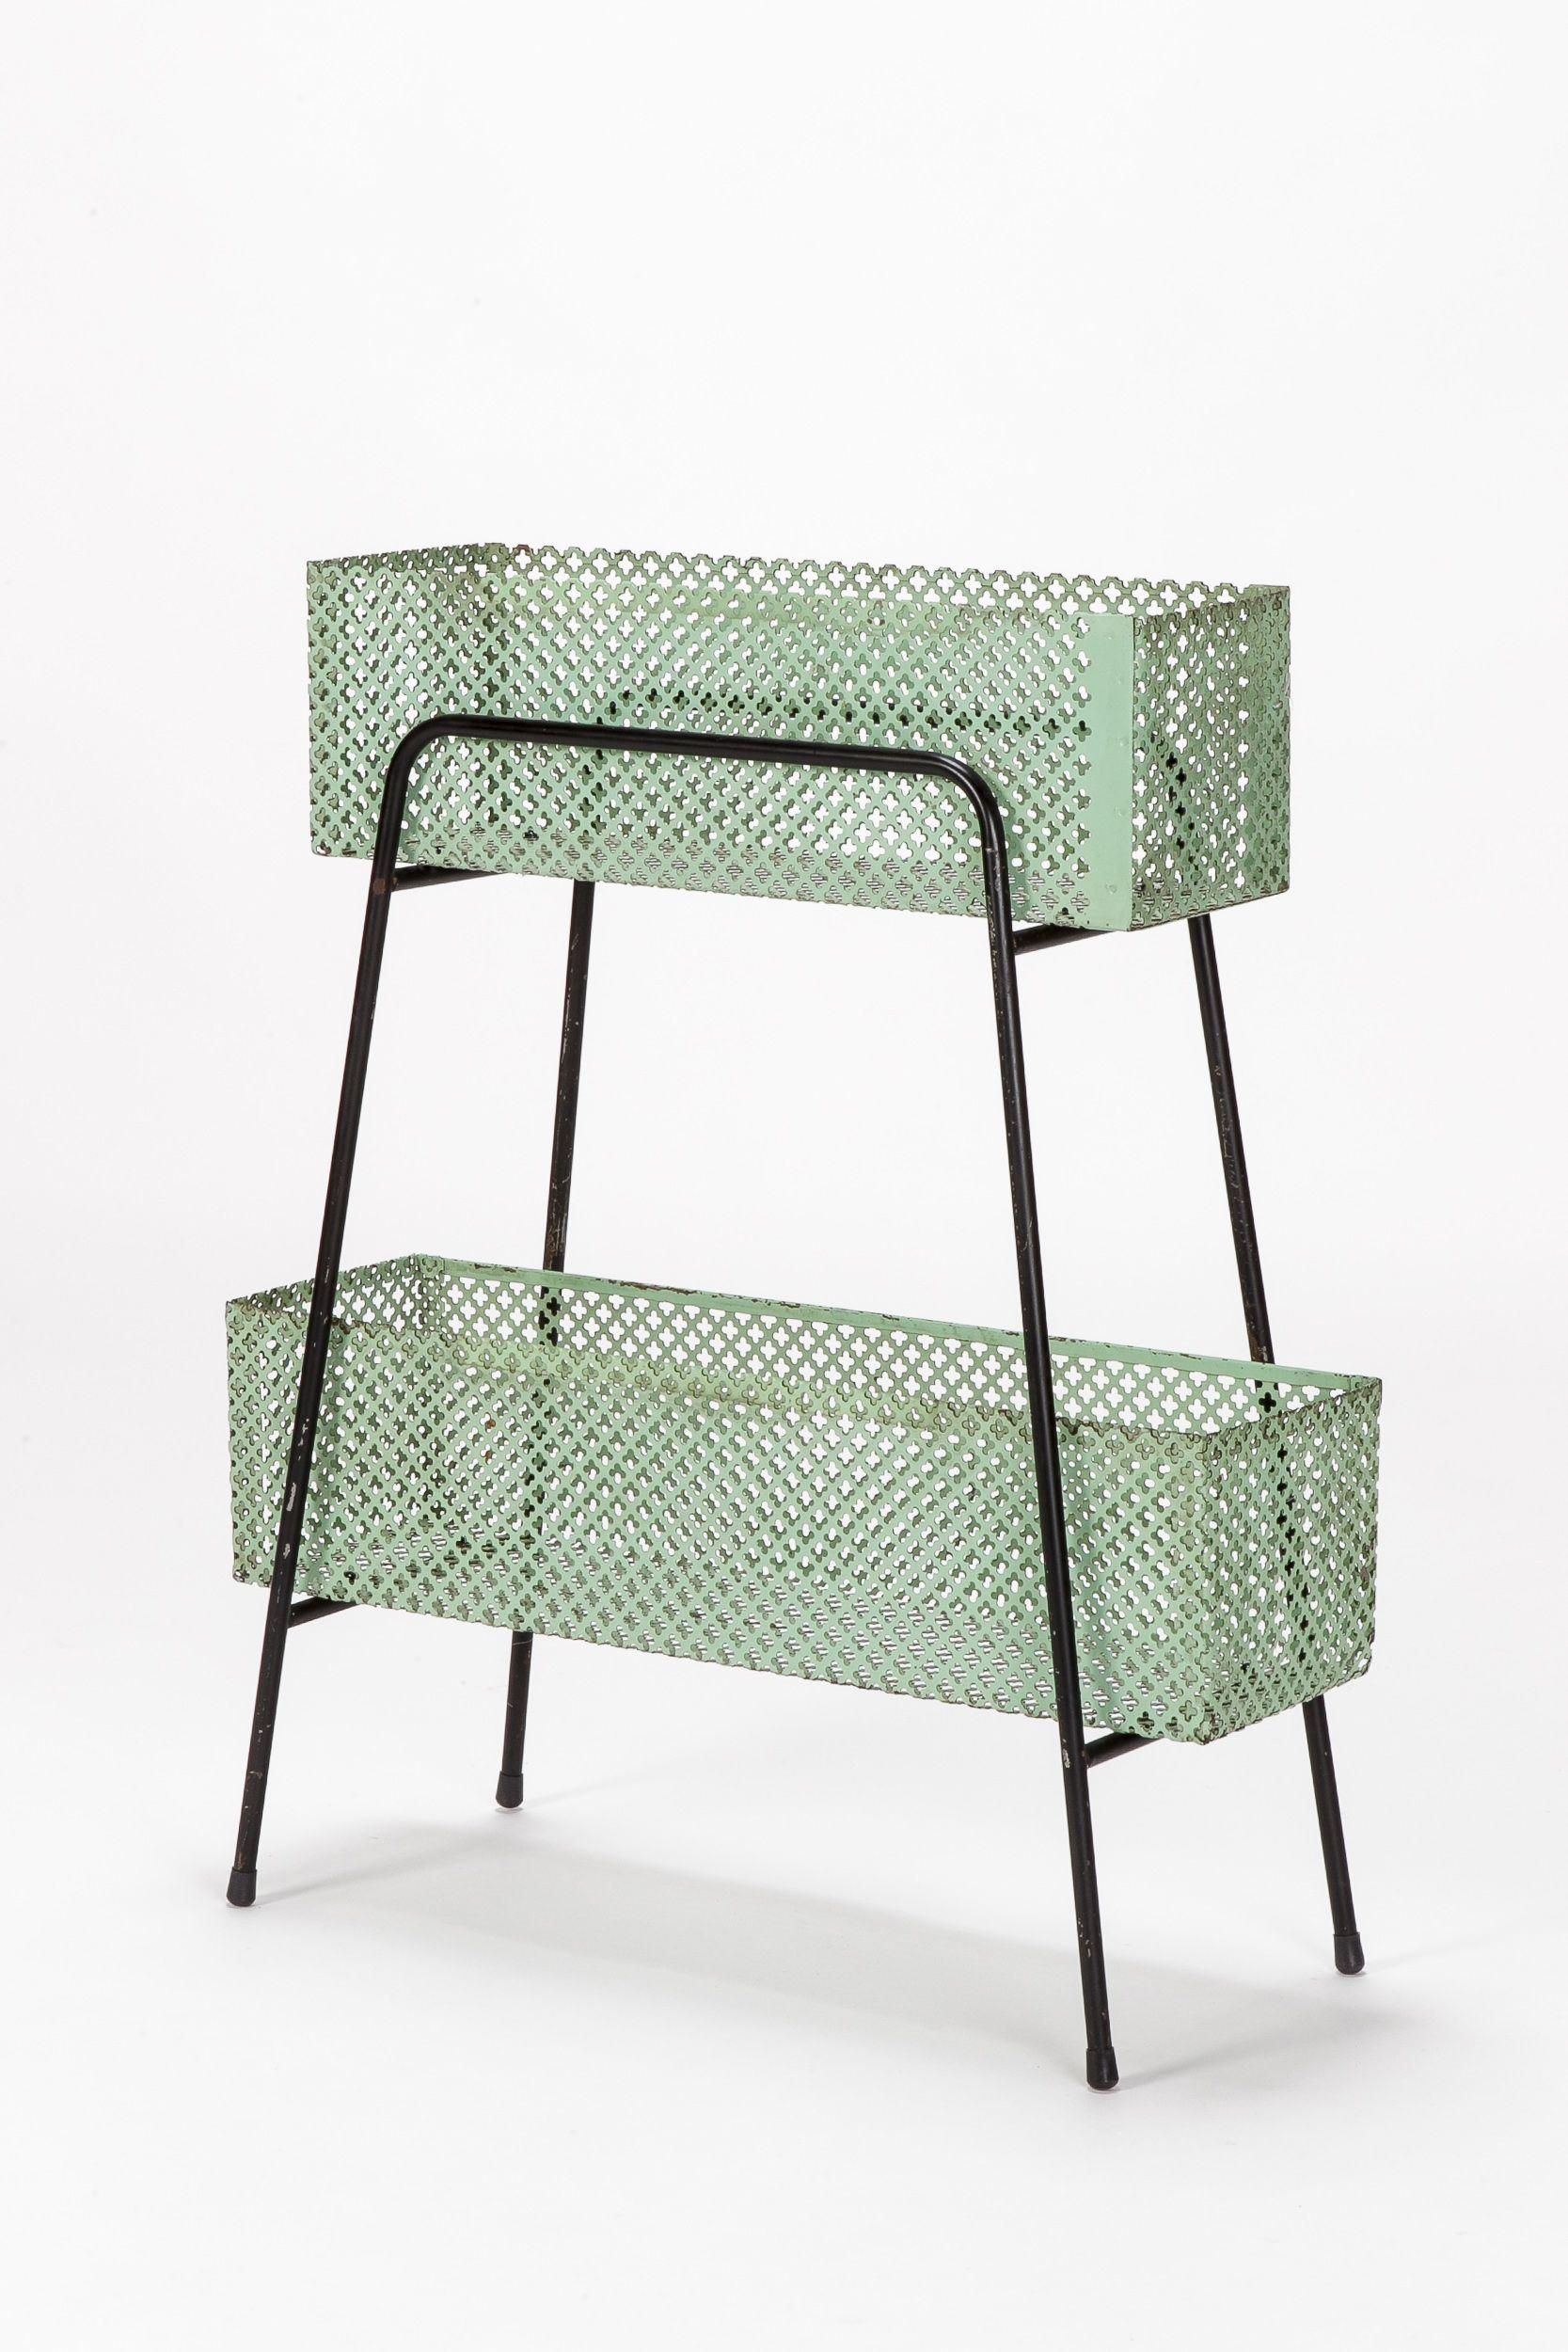 Mathieu Matégot; Enameled Metal Planter, 1950s. | H O M E 。 | Metal ...